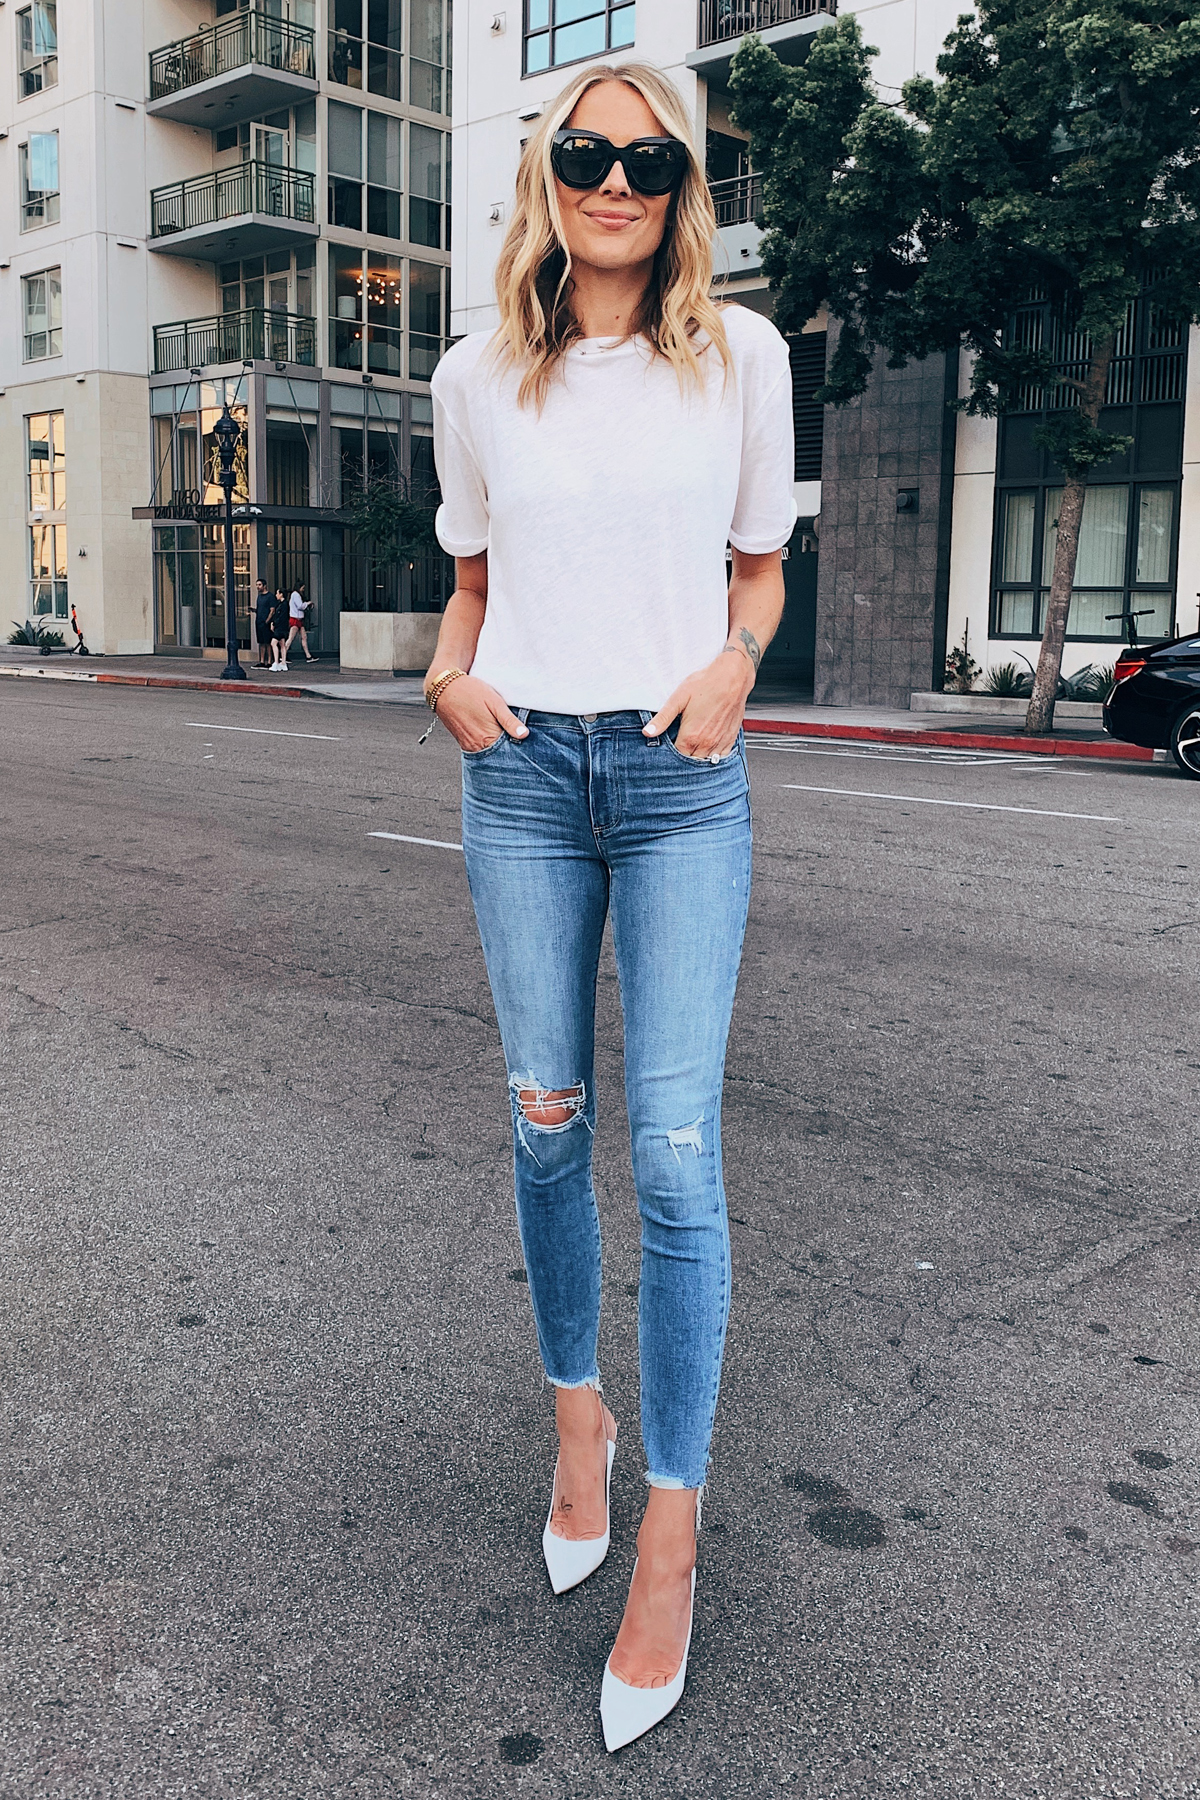 Fashion Jackson Wearing White Tshirt Paige Ripped Skinny Jeans White Pumps